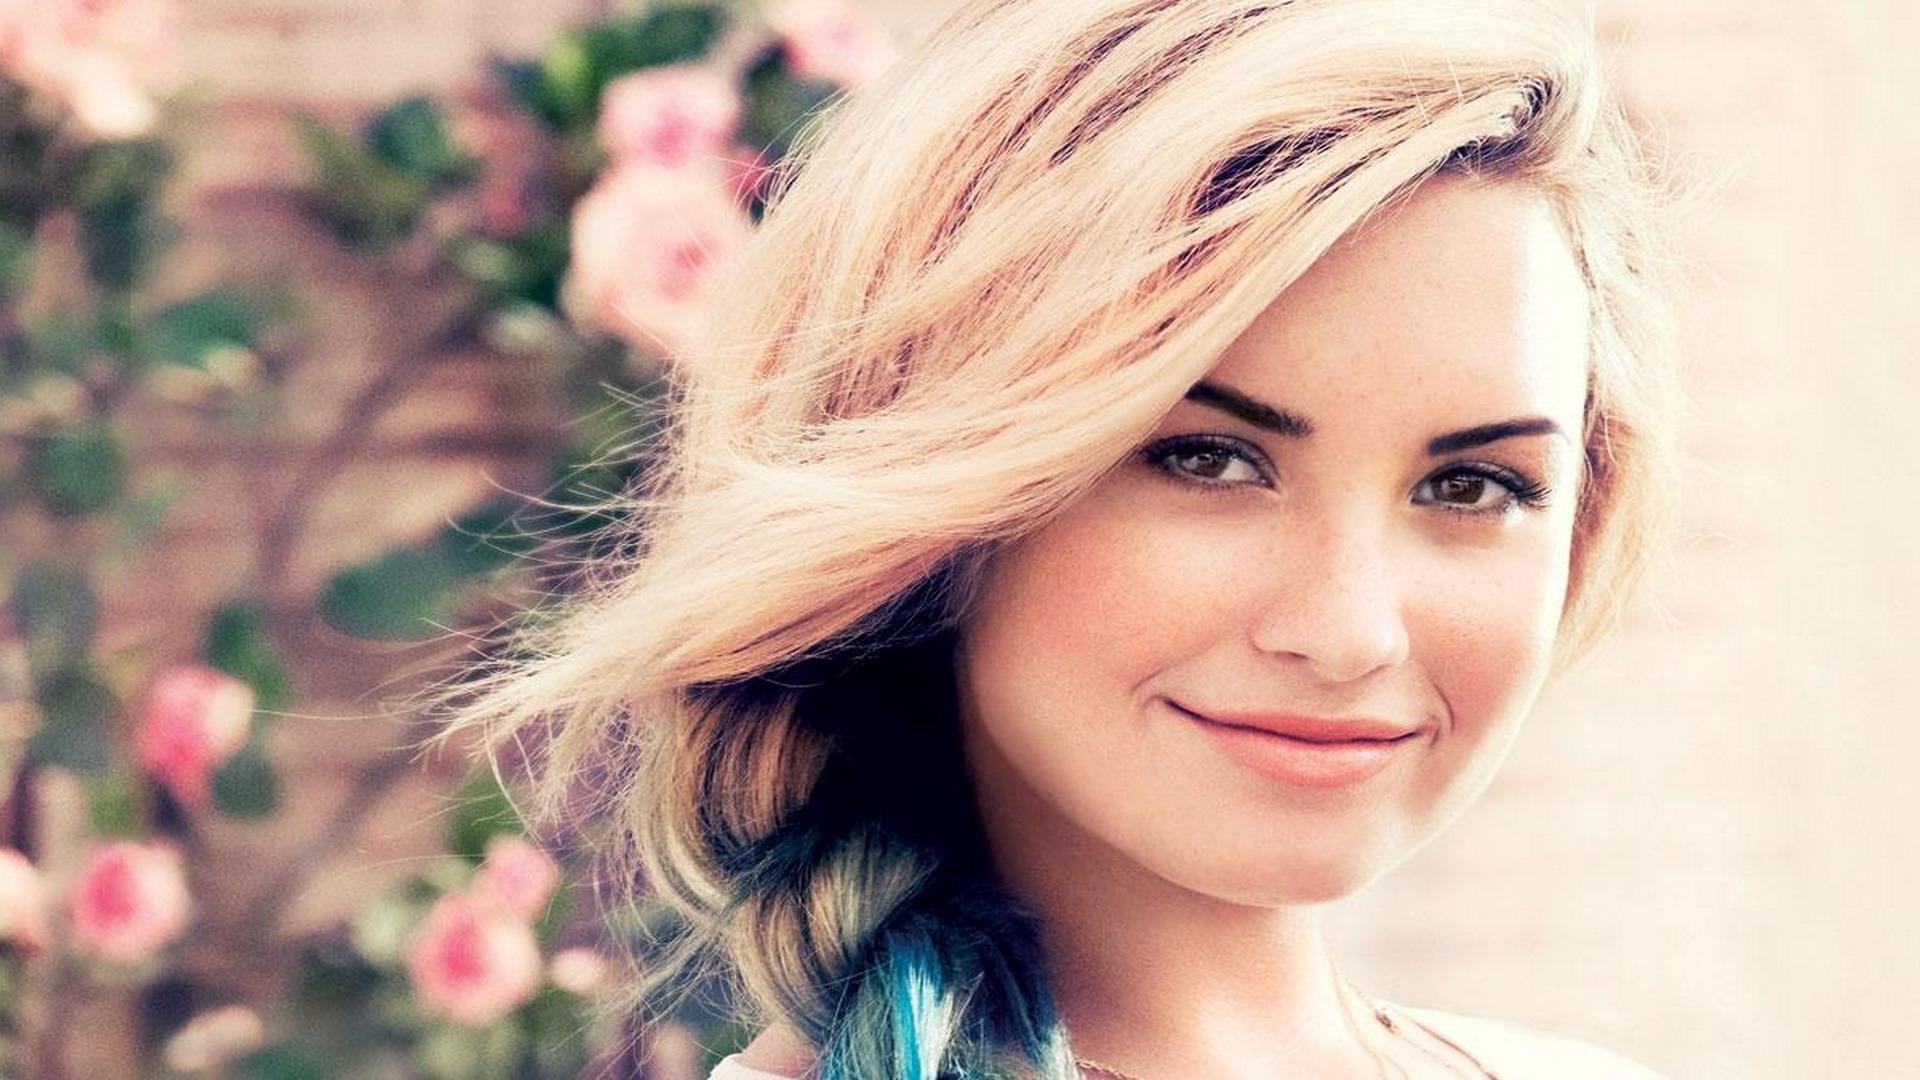 Wallpapers De Demi Lovato 2015 1920x1080